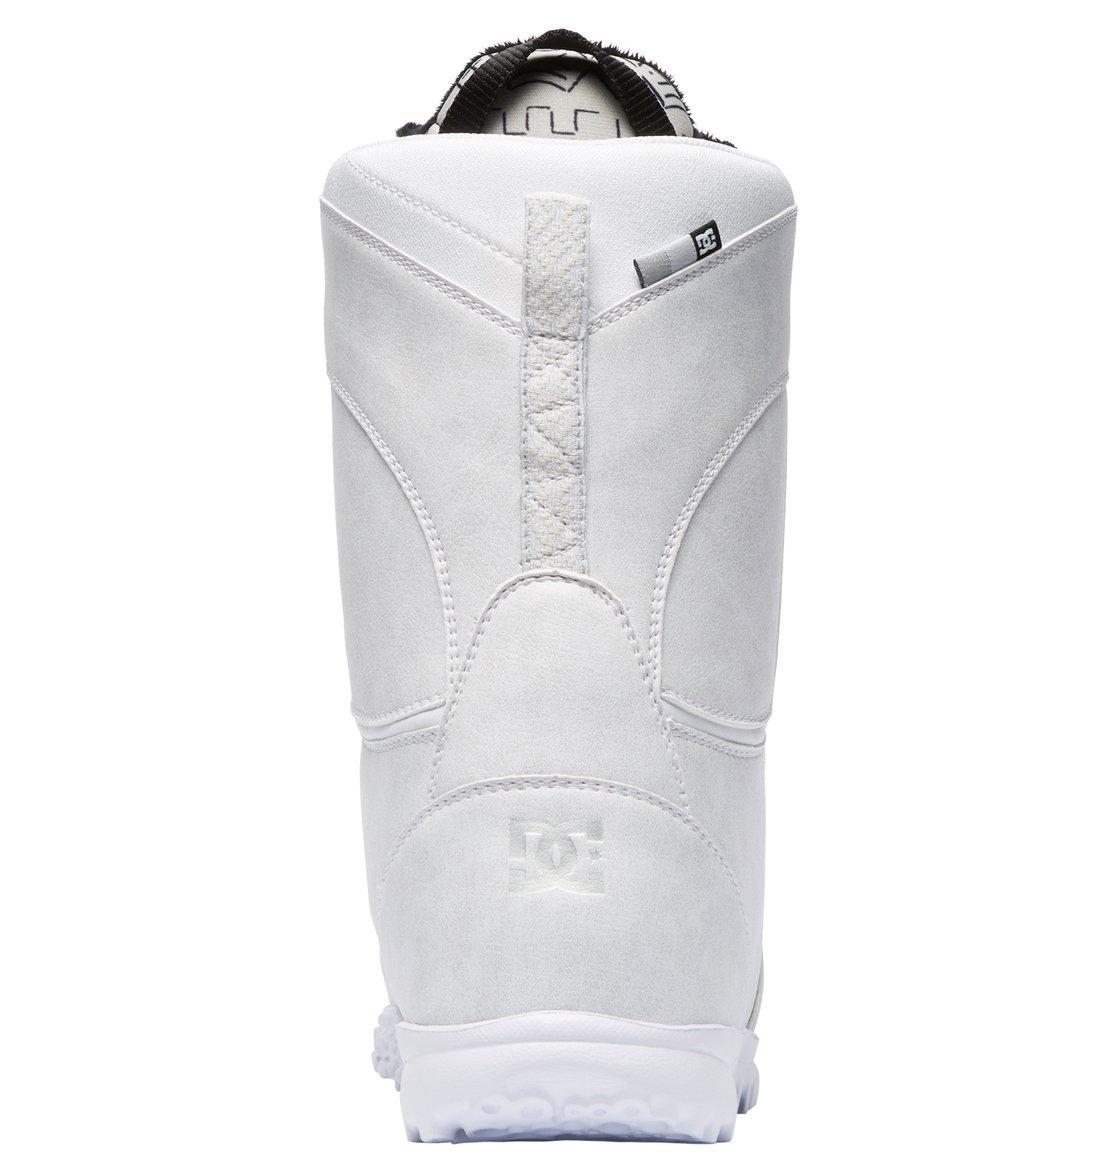 Dc Shoes Women S Lotus Boa Snowboard Boots Adjo100016 Ebay